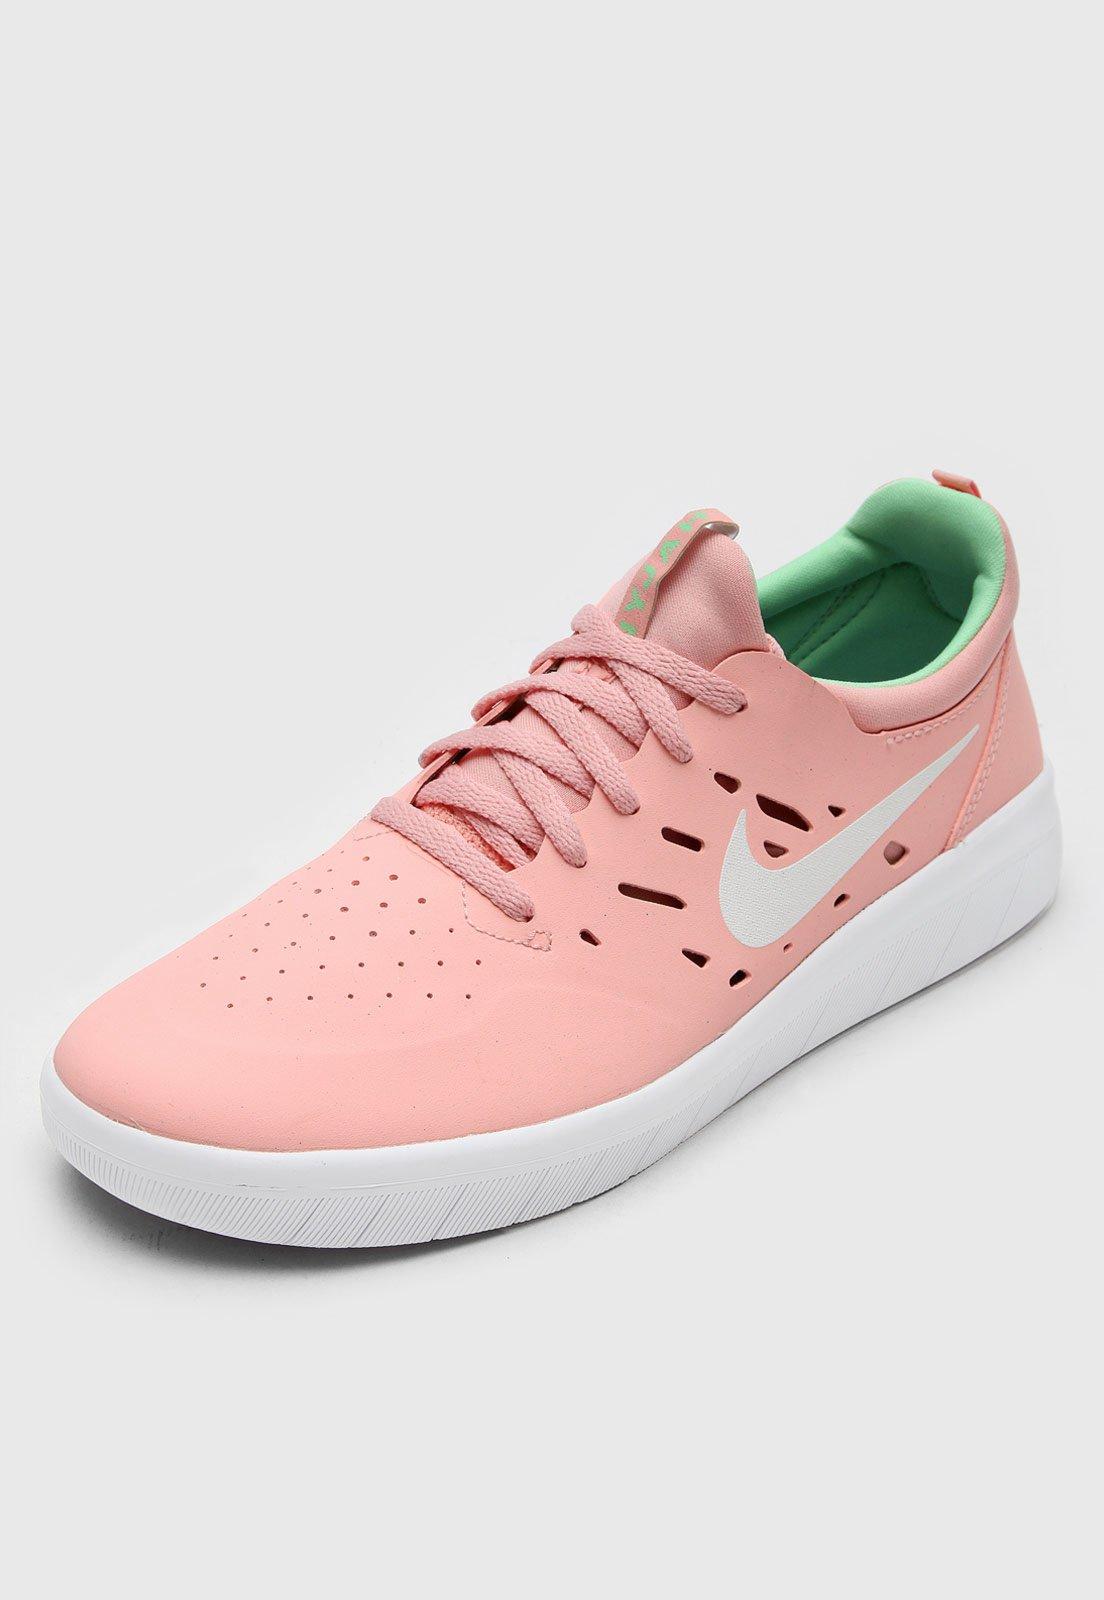 Reverberación esta Alerta  Tênis Nike SB Nyjah Free Rosa - Compre Agora   Dafiti Brasil